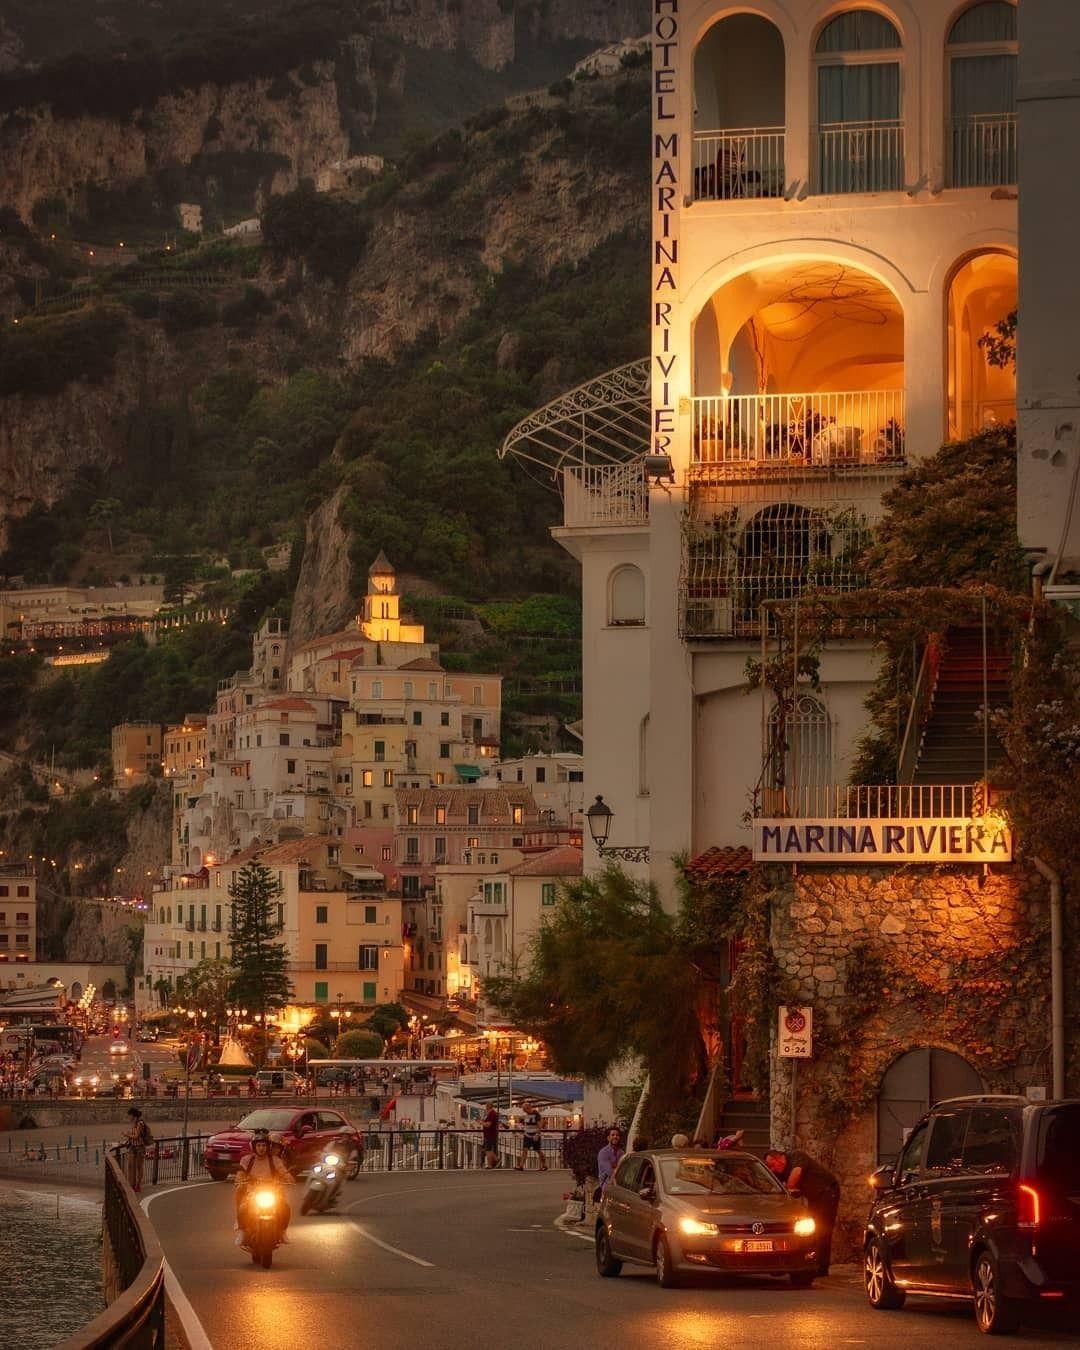 : Pictoturo - wanderlusteurope: An evening drive in Amalfi,. Pictoturo - wanderlusteurope: An evening drive in Amalfi,.